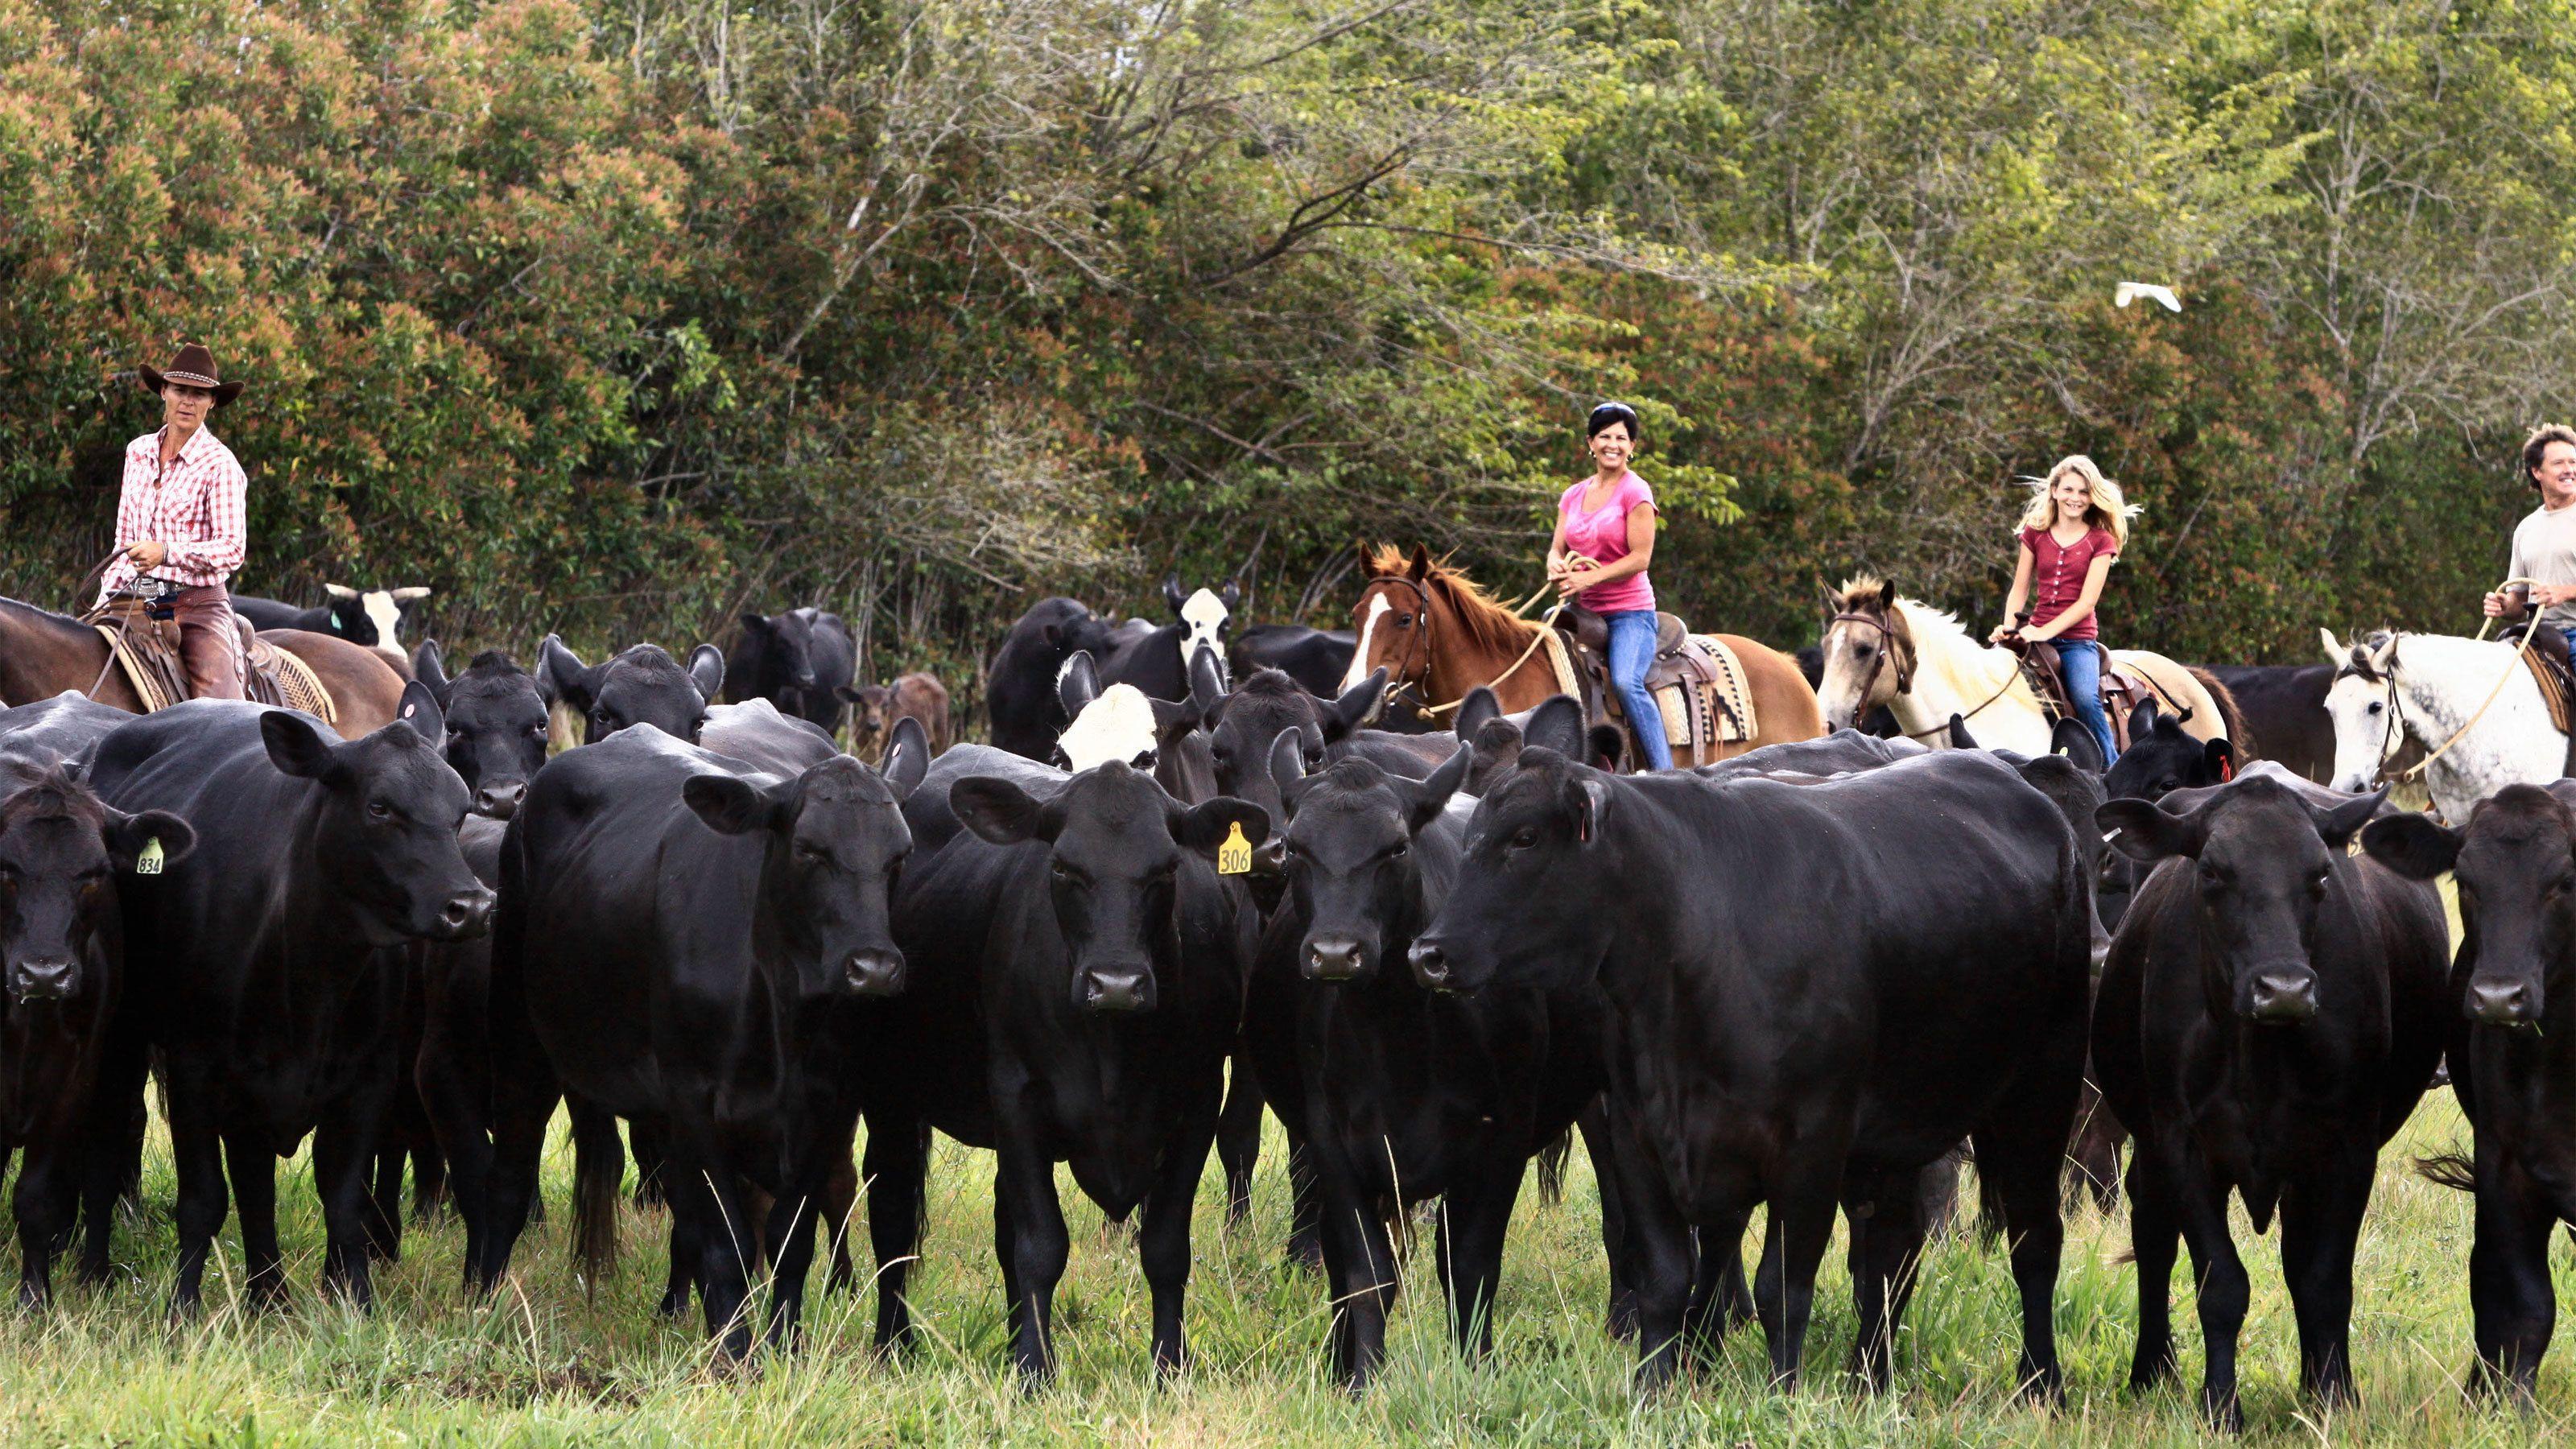 cattle being herded by people on horseback in Kauai